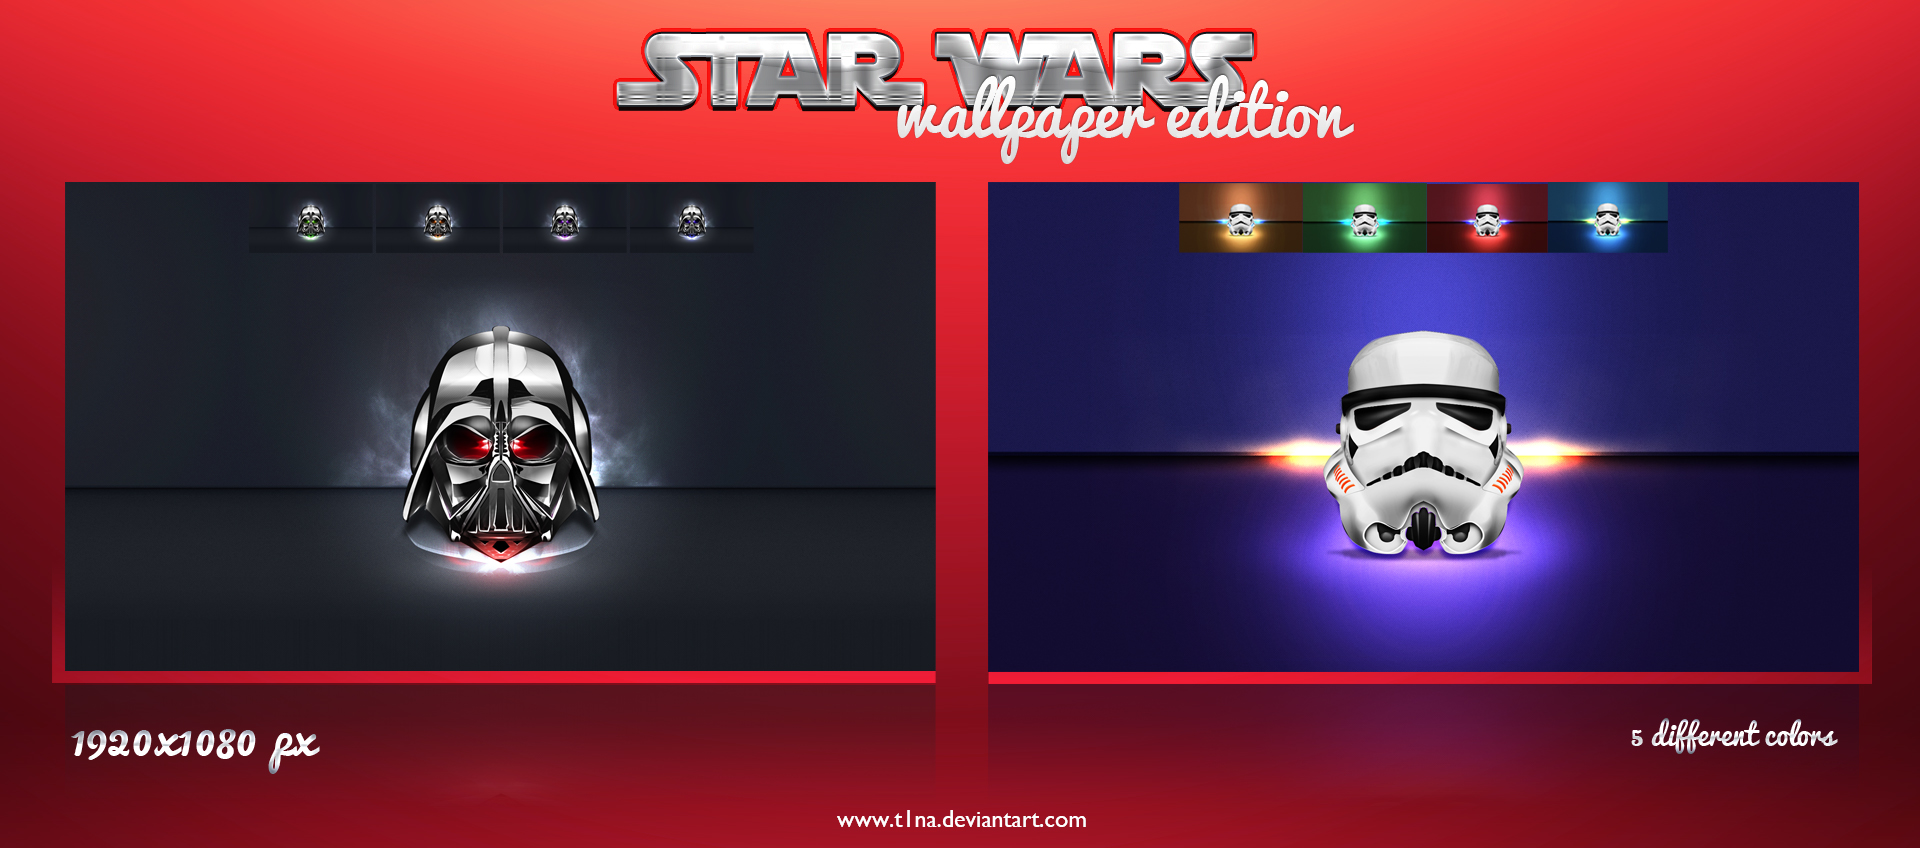 Star Wars Wallpaper Edition By T1na On Deviantart